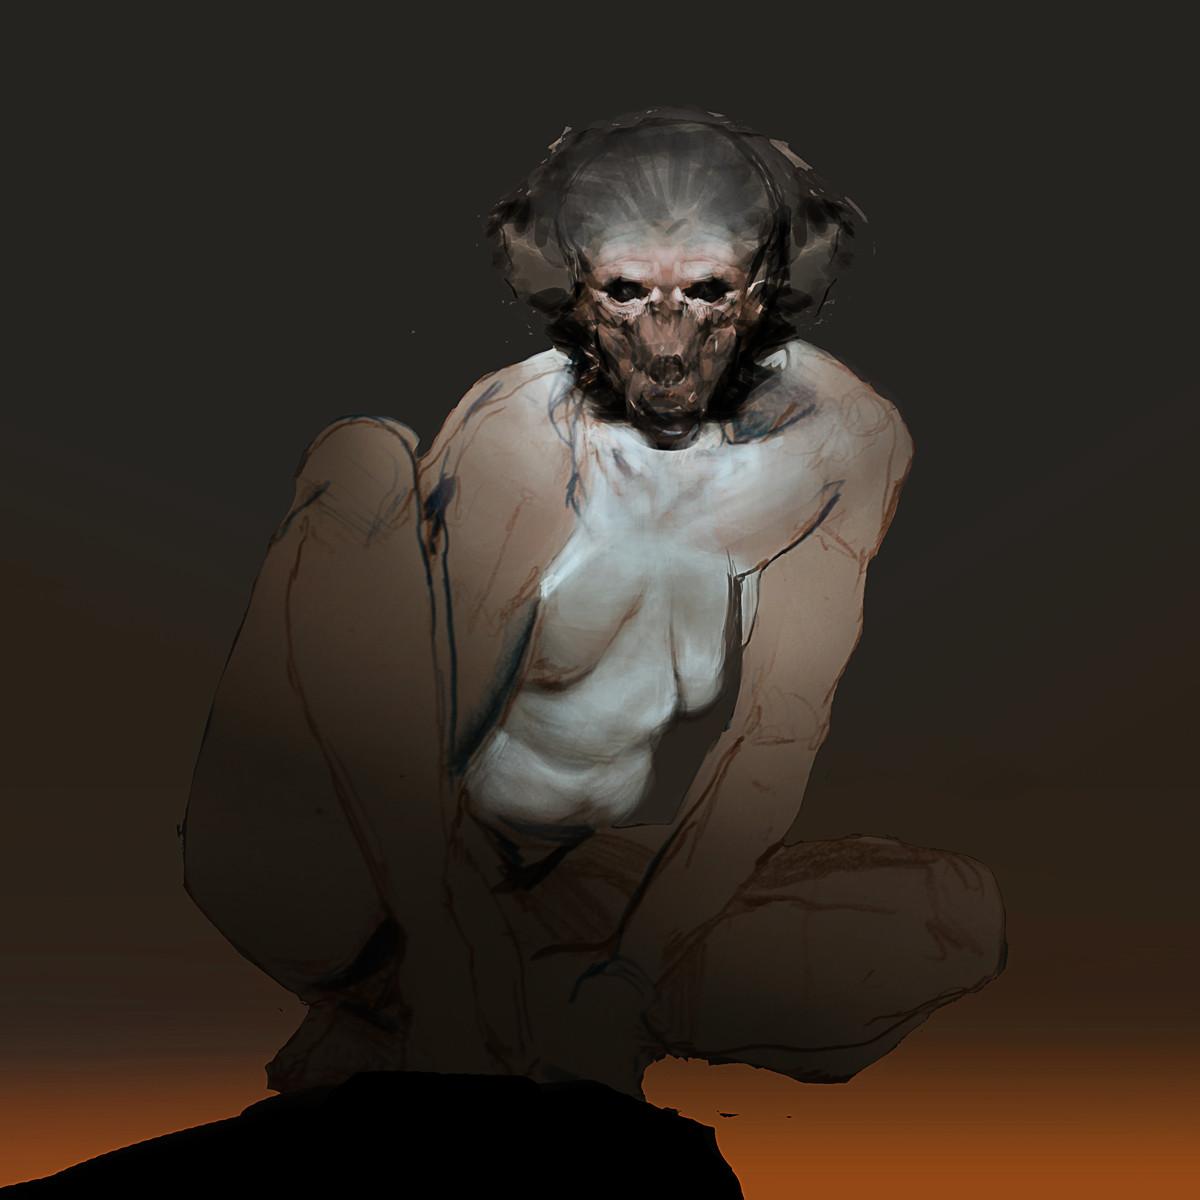 Jeff simpson monkey sketch